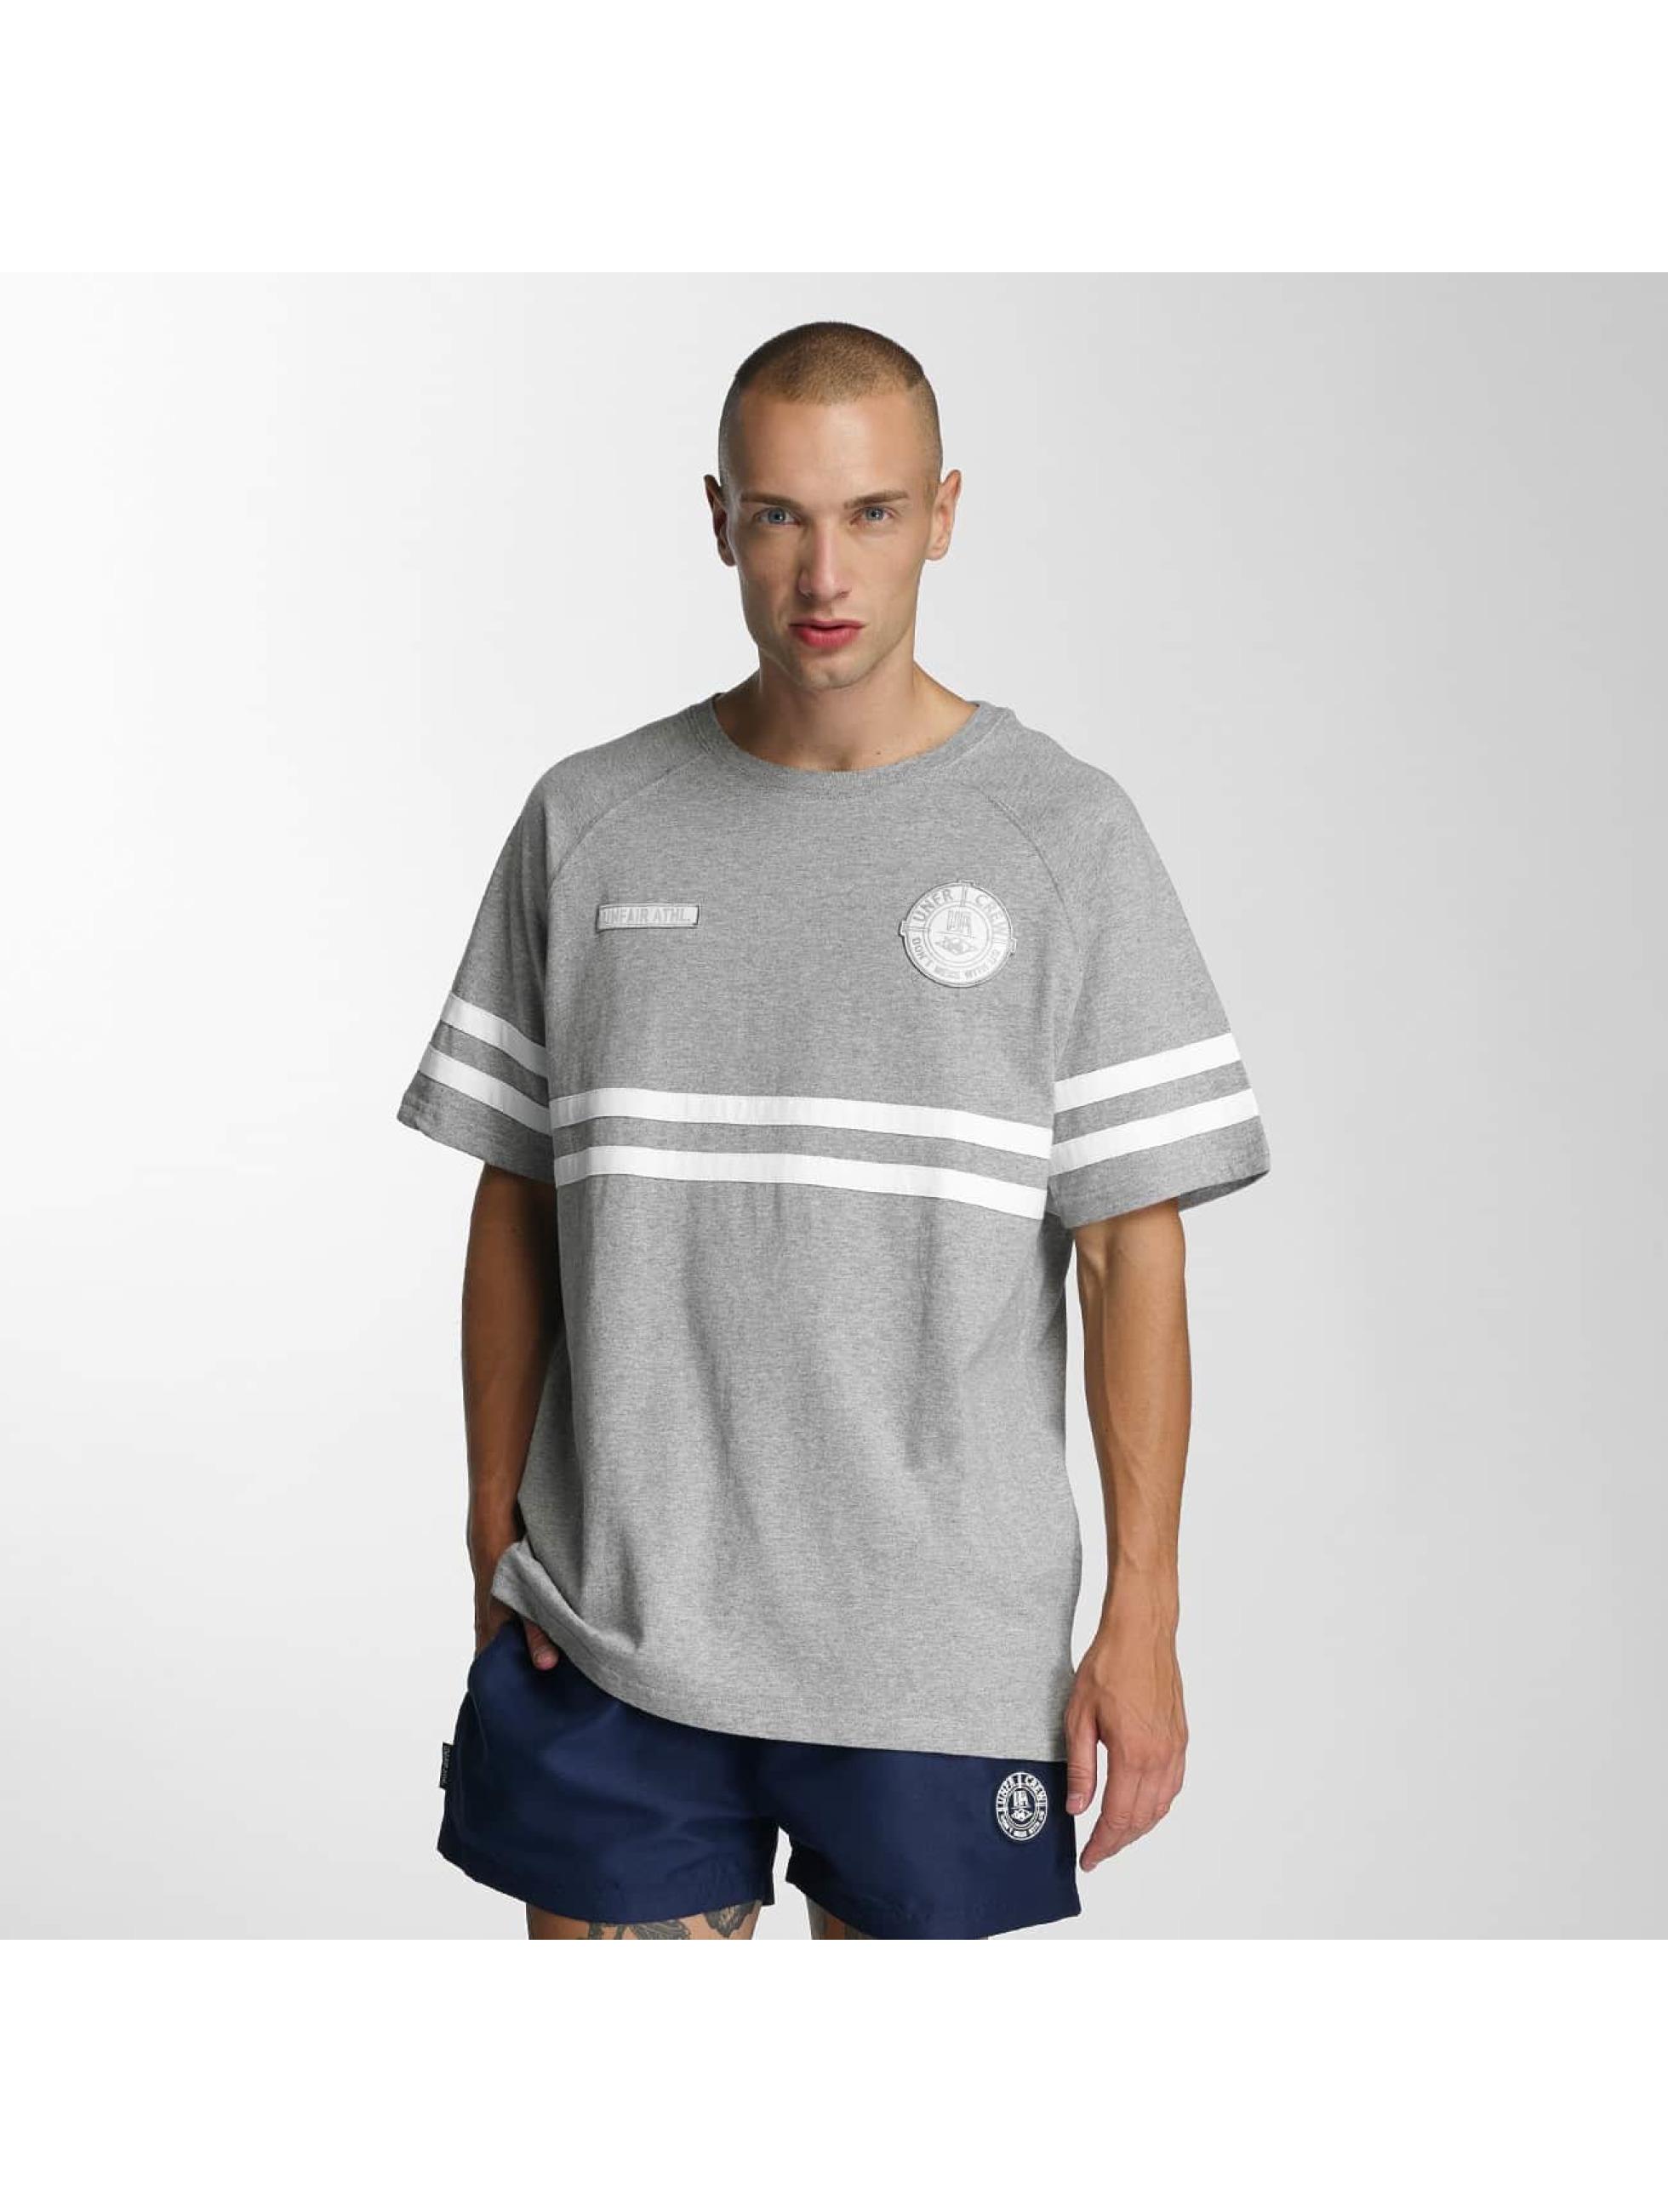 UNFAIR ATHLETICS Männer T-Shirt DMWU in grau